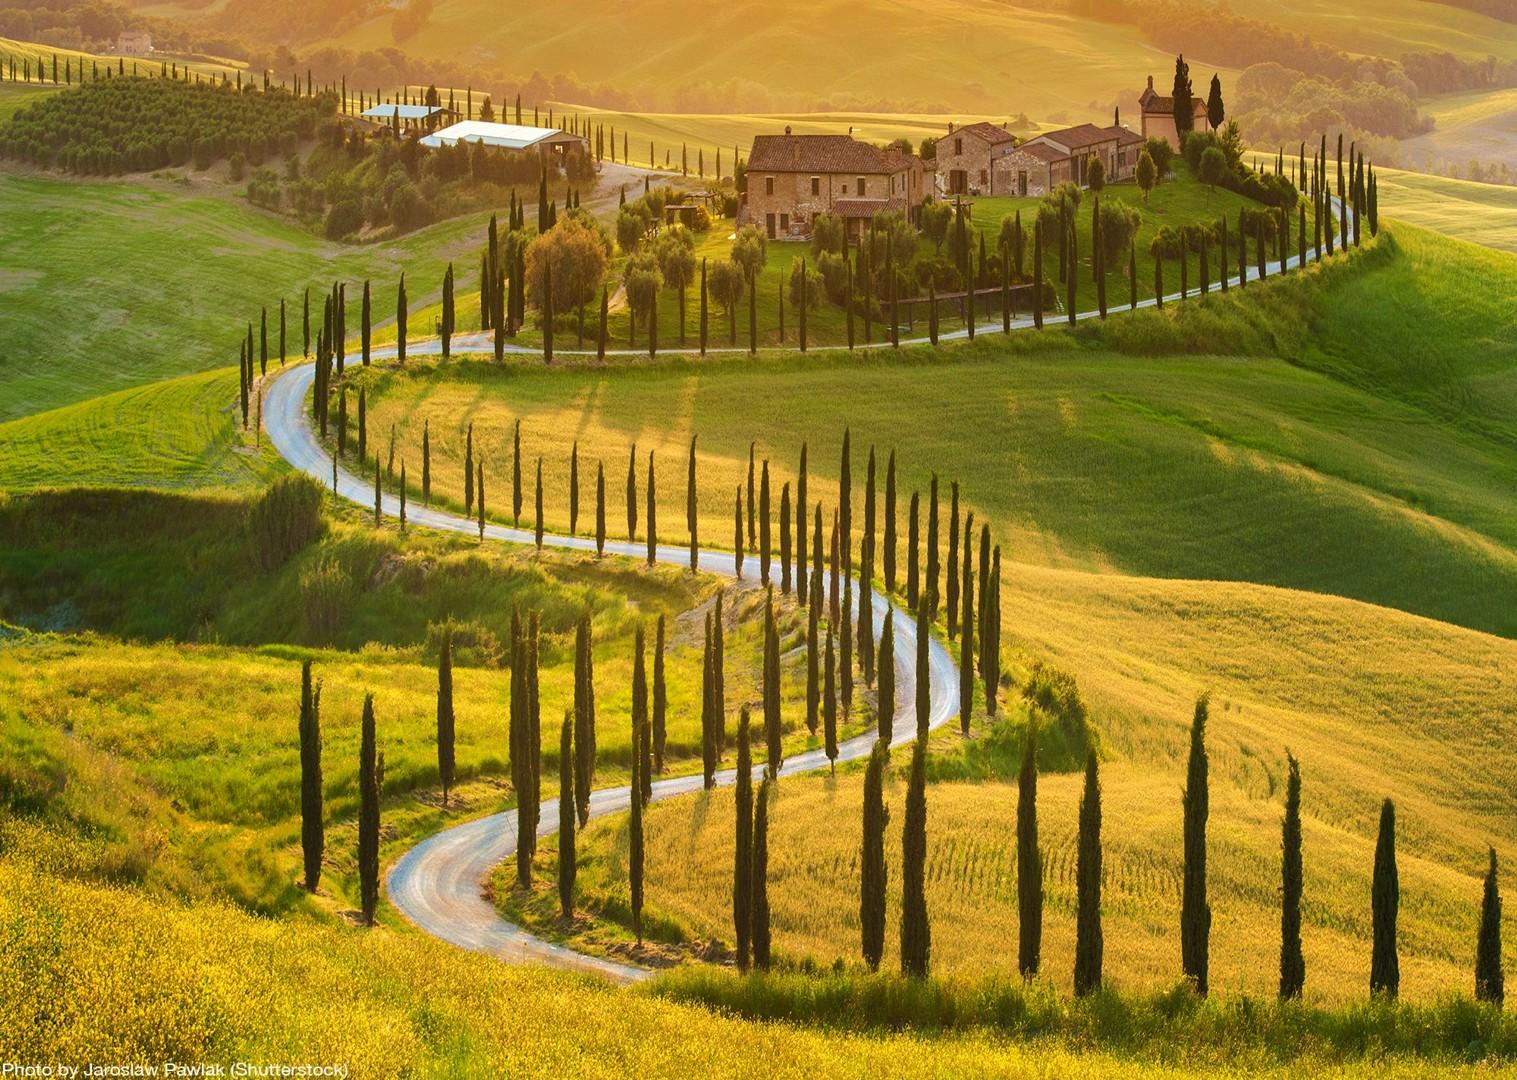 cypress-snakes-tuscany-leisure-bike-tour-self-guided.jpg - Italy - Tuscany - Giro della Toscana - Guided Road Cycling Holiday - Road Cycling